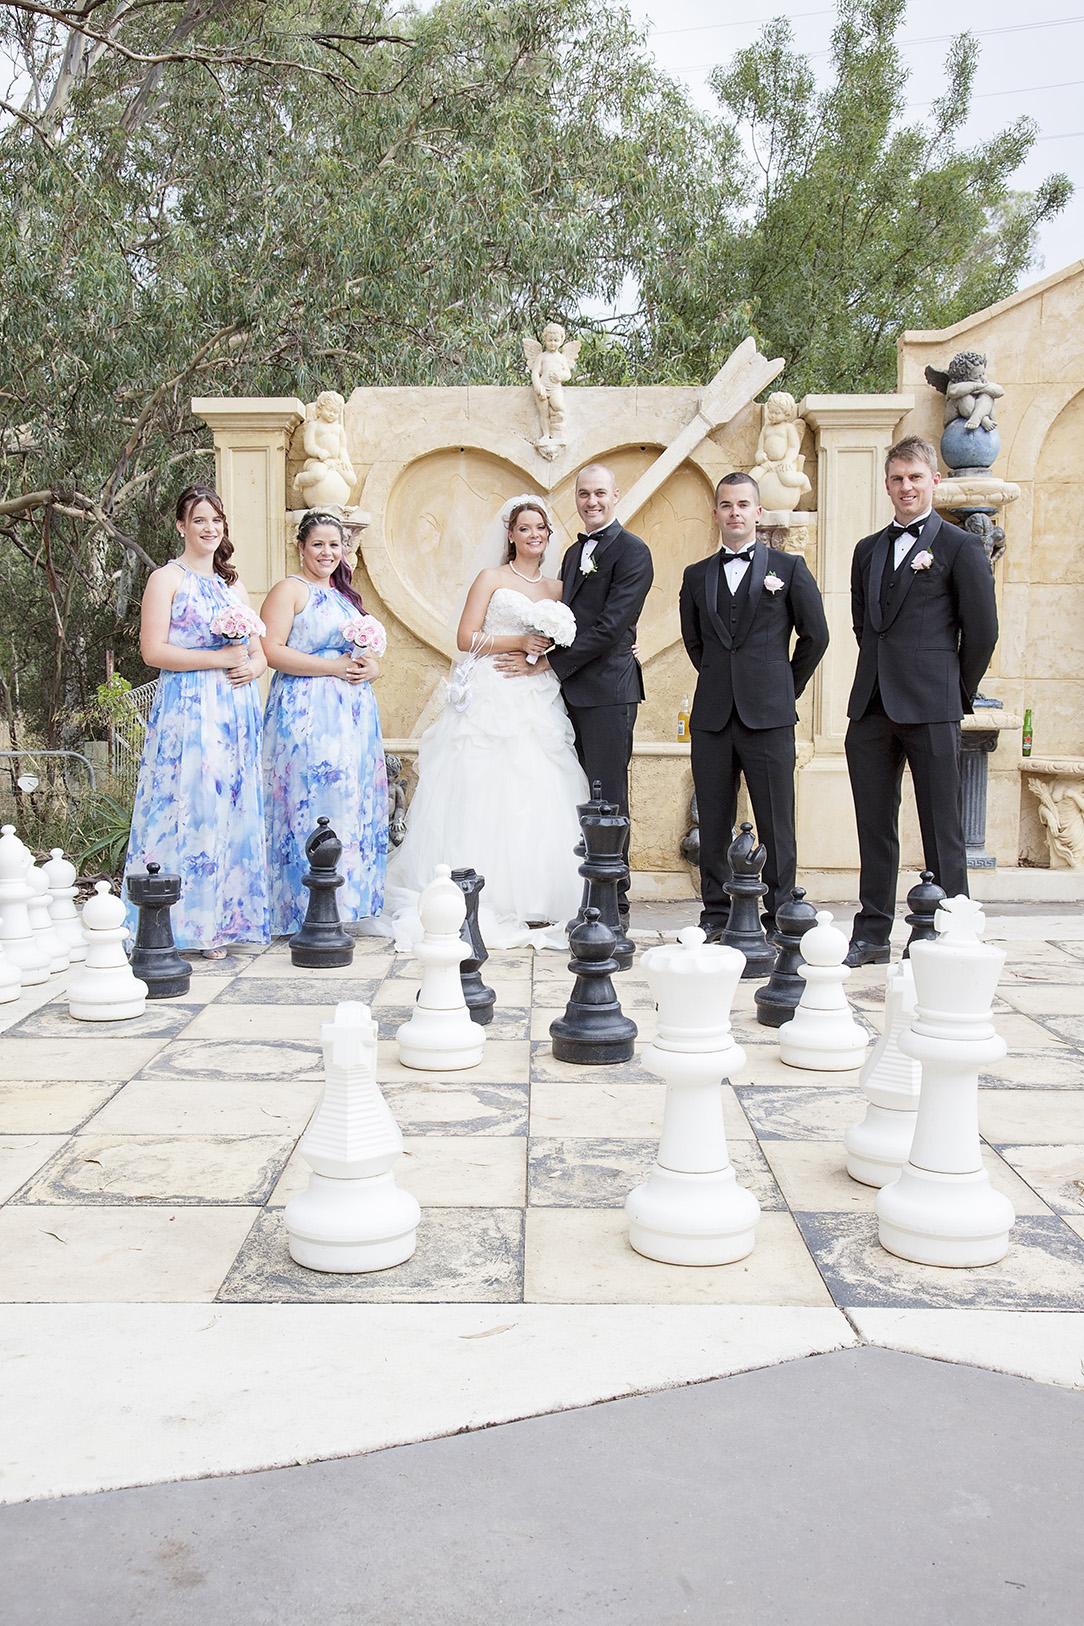 One Tree Hill Wedding Photography Art Through Da Vinces Eyes 18.jpg